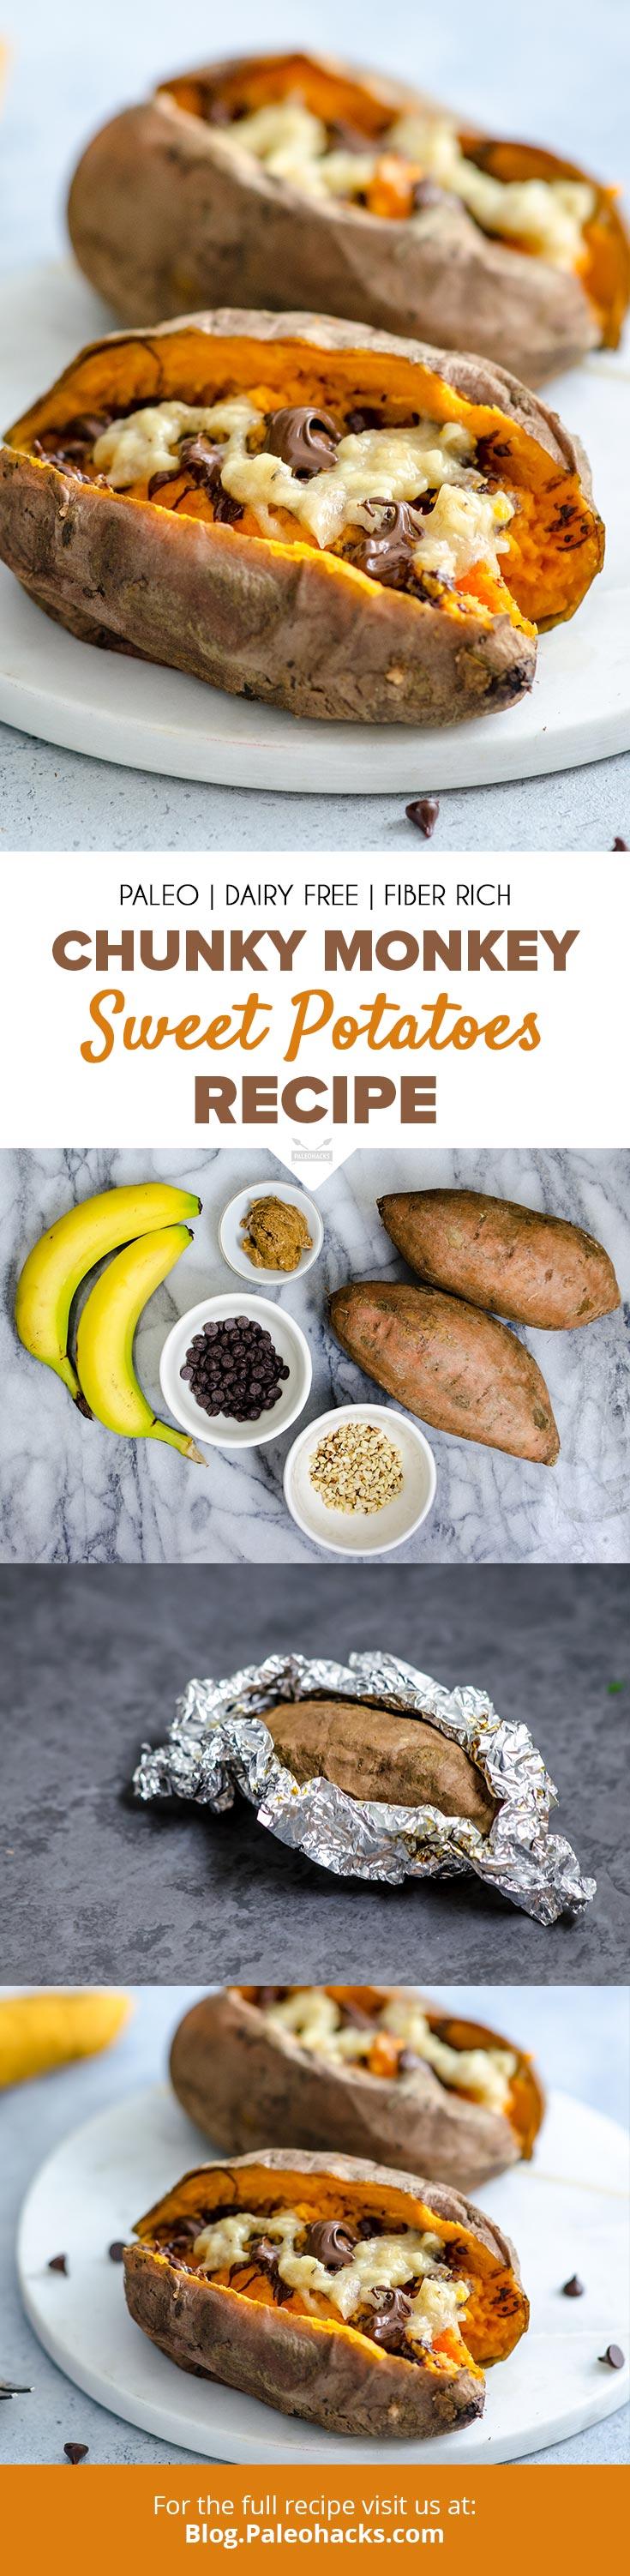 PIN-Chunky-Monkey-Sweet-Potatoes-Recipe.jpg